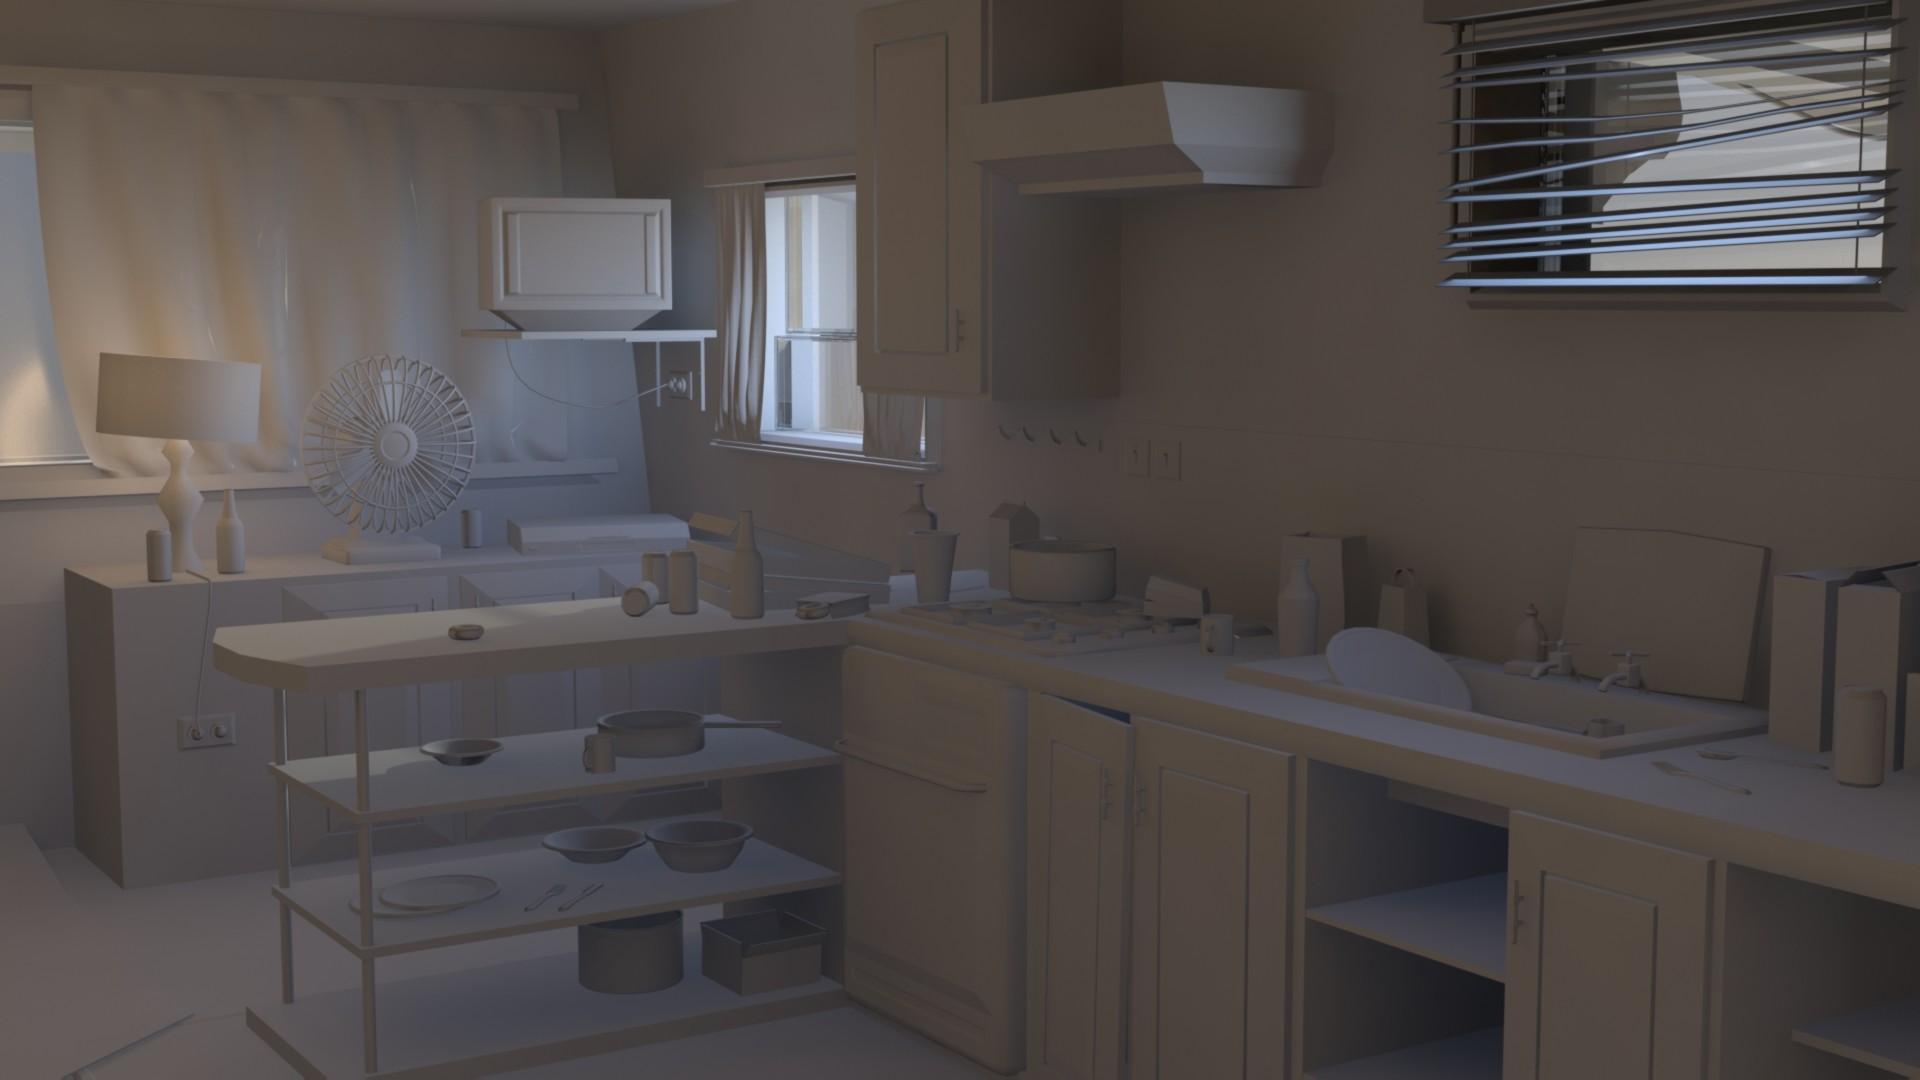 ArtStation - Trevor's trailer - Interior (WIP), Taylor Olbison